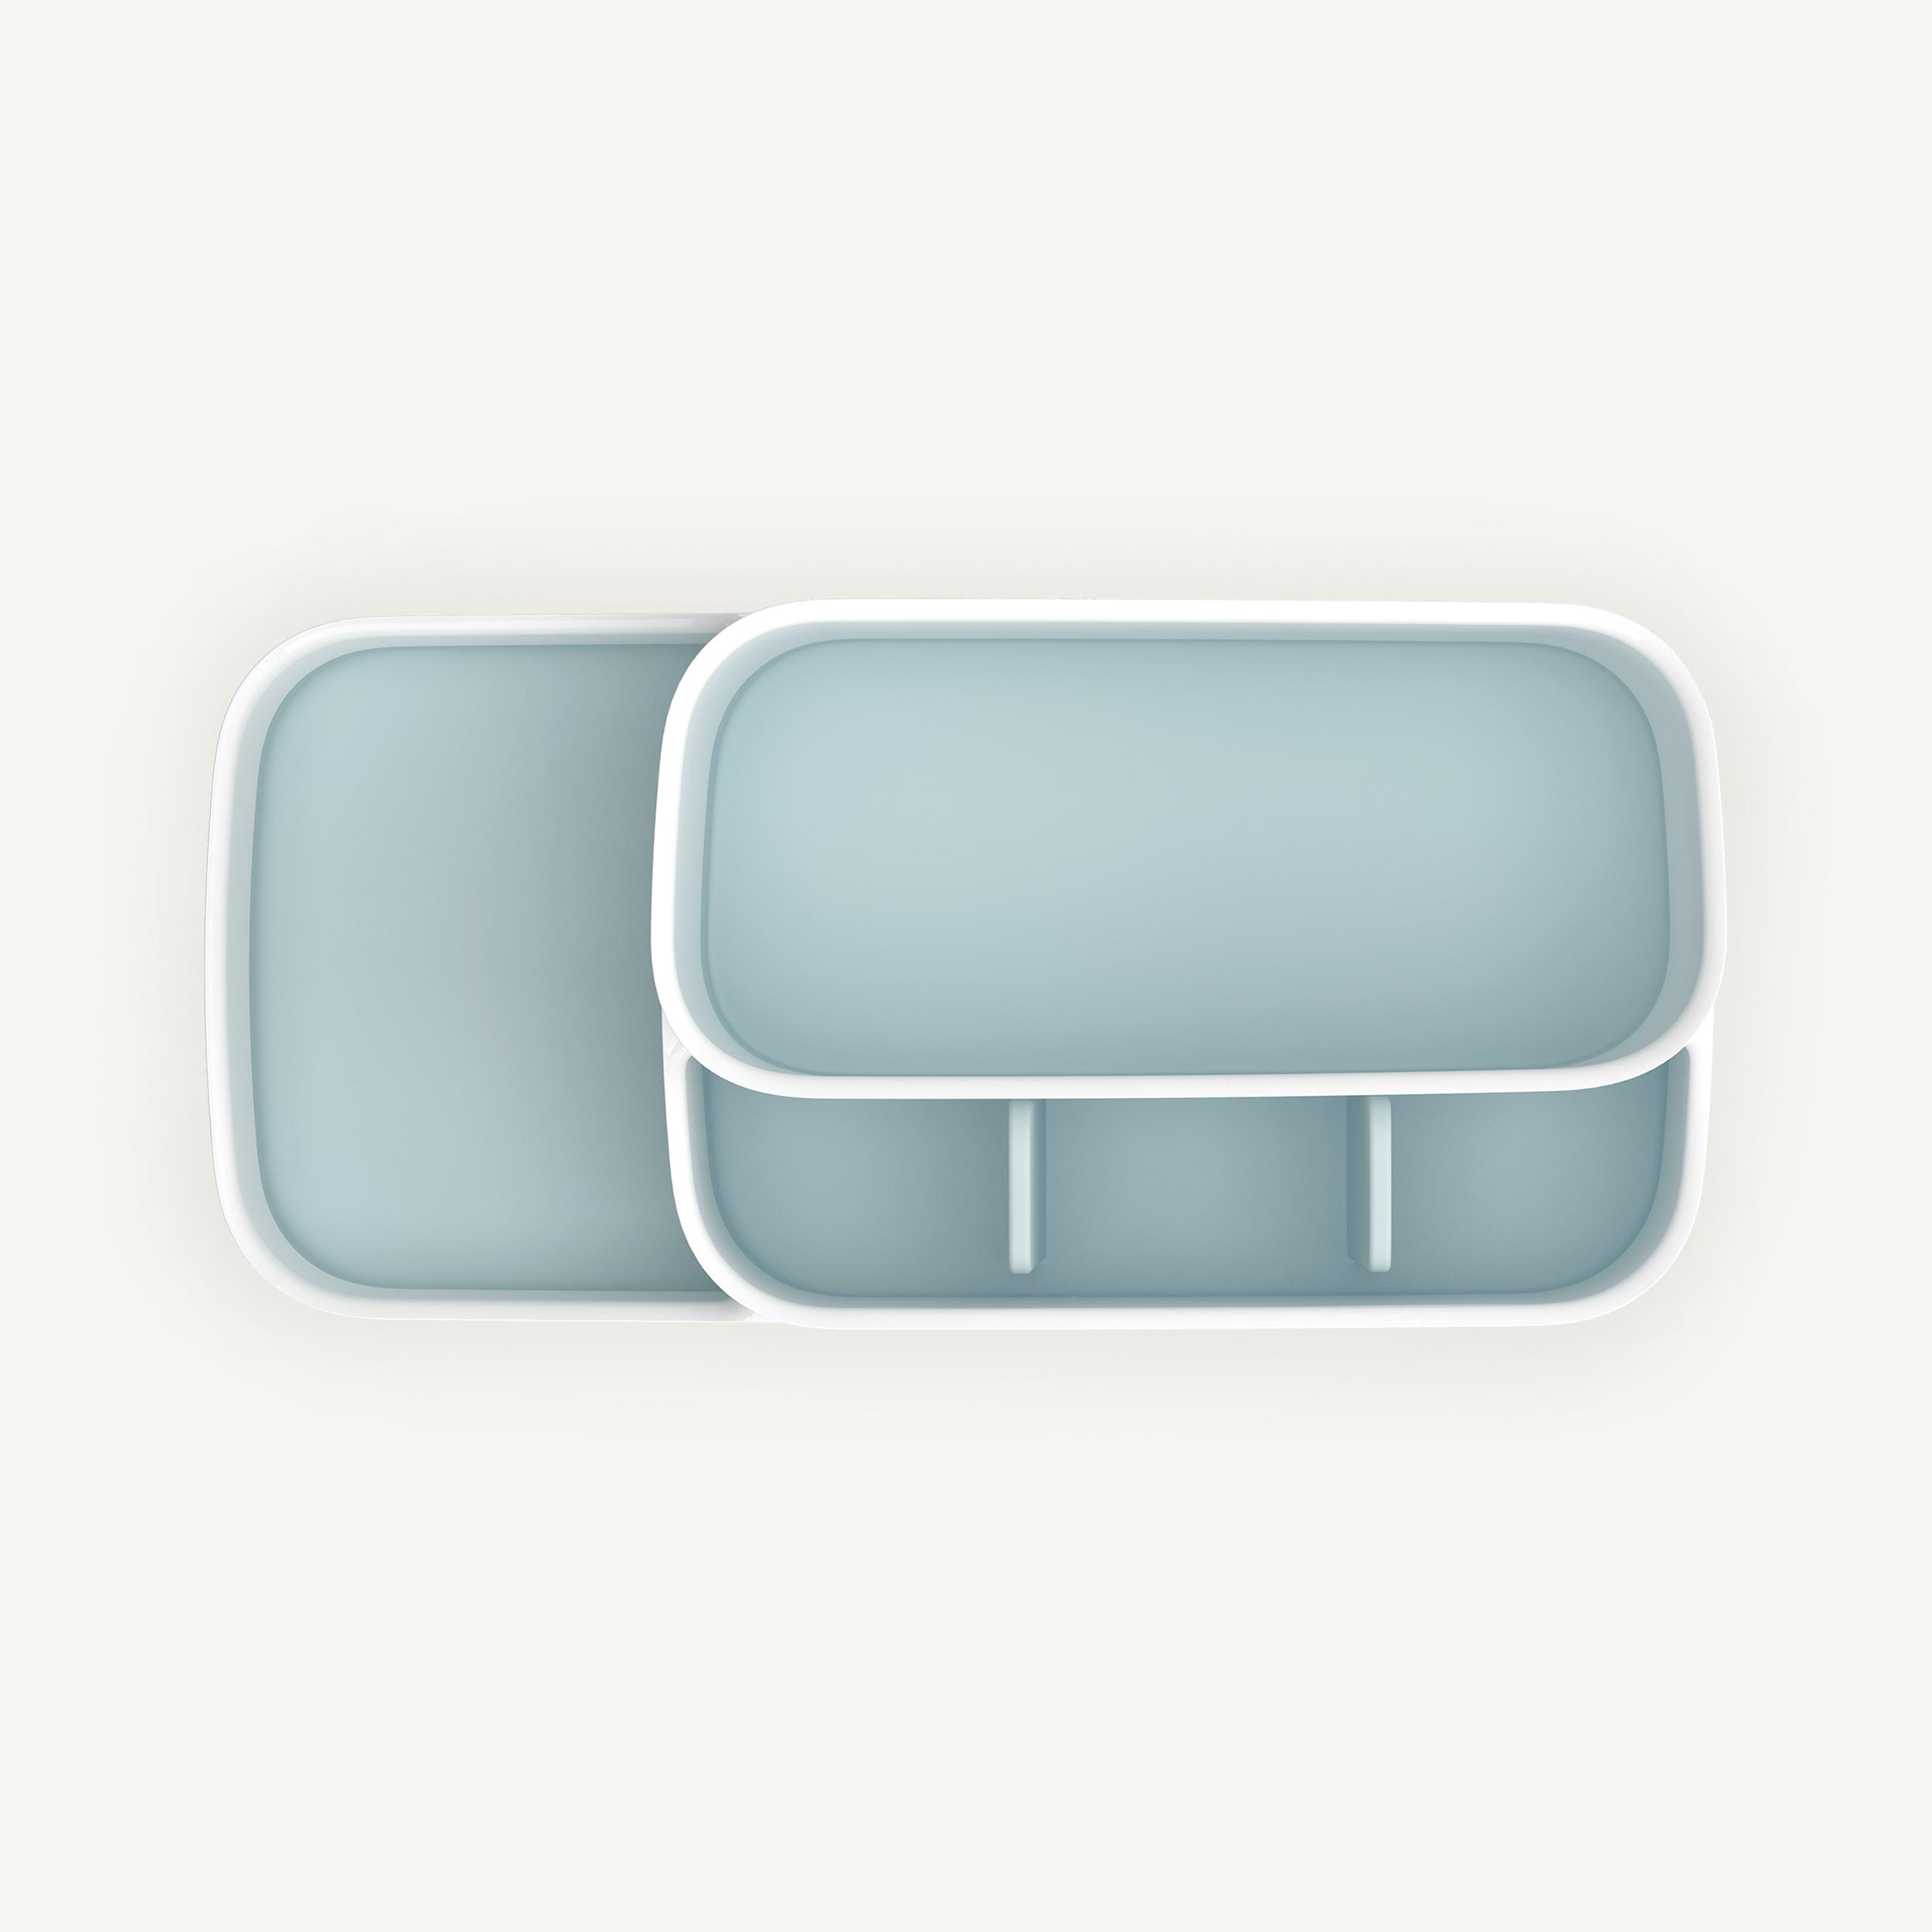 Studio Wood - JJ Bathroom Caddy Product Design 01